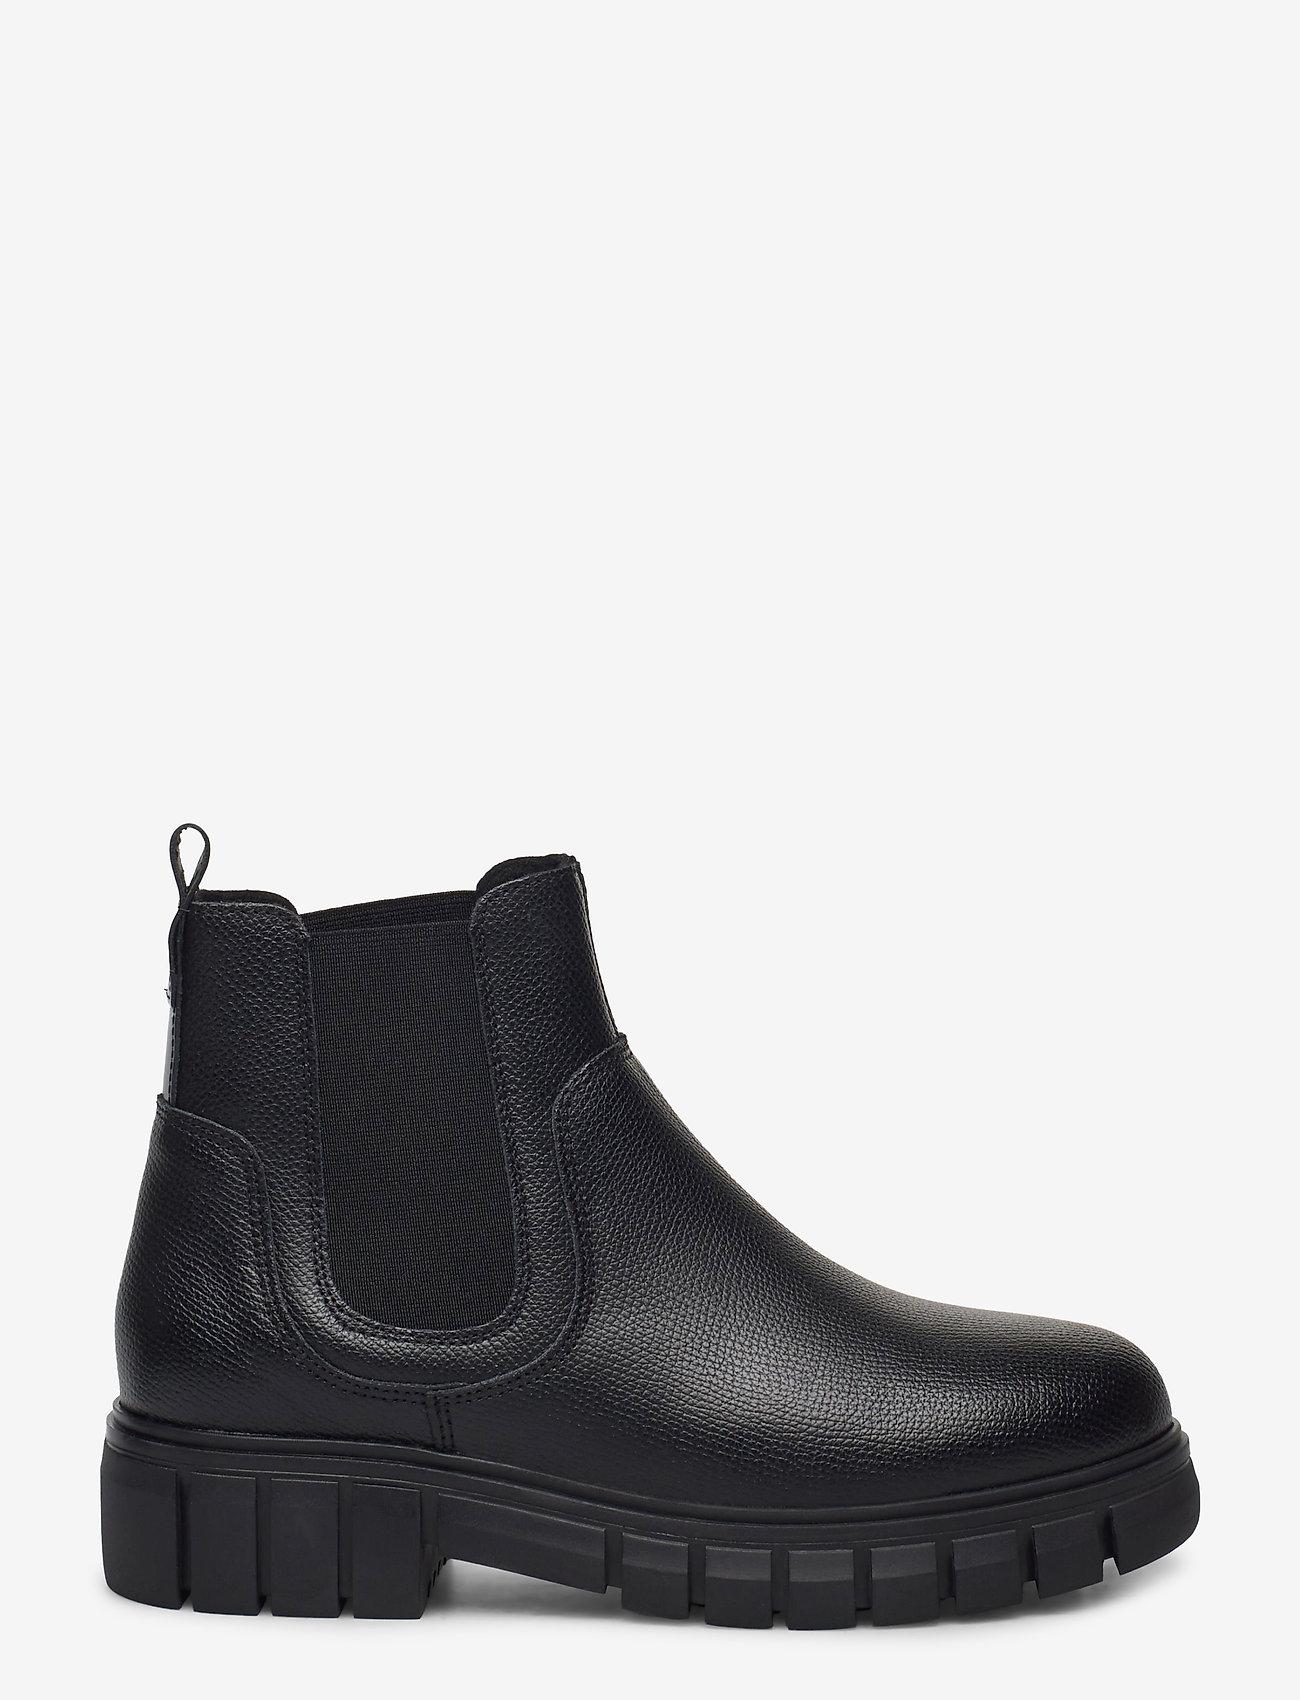 Shoe The Bear - STB-REBEL CHELSEA WARM L - chelsea boots - black - 1